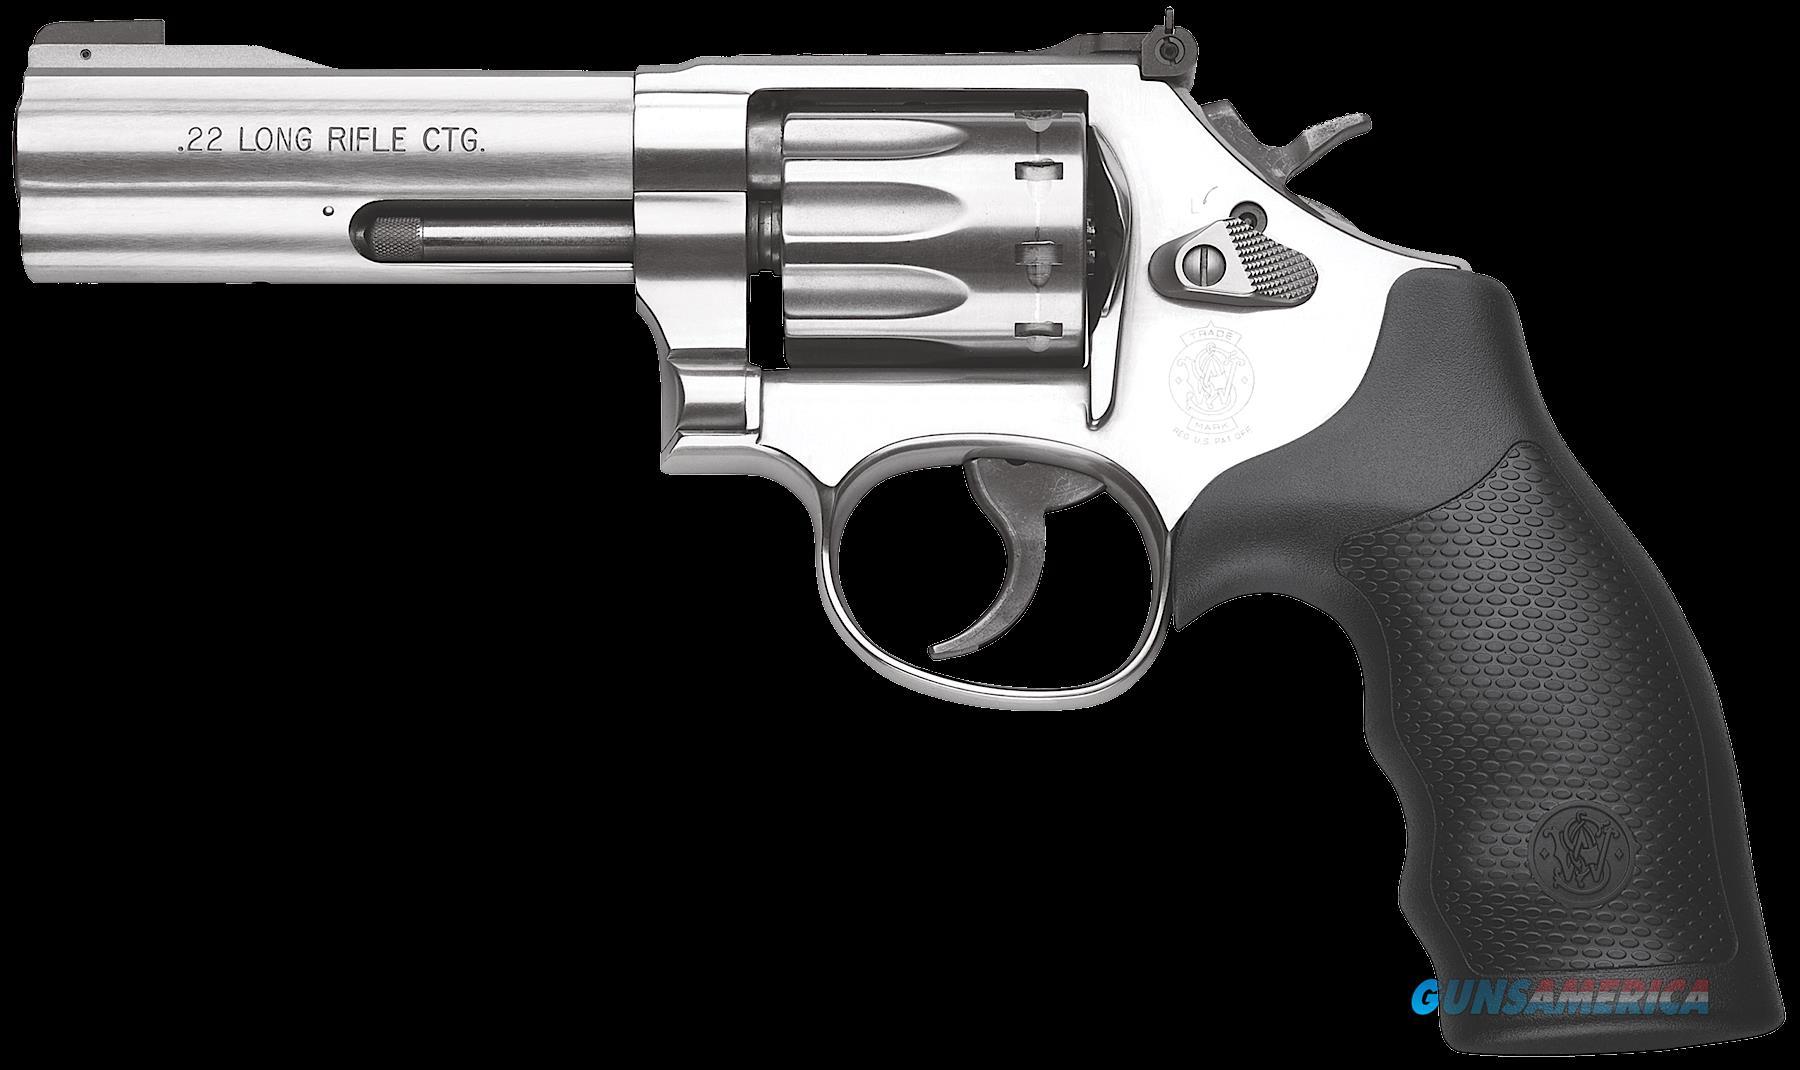 Smith & Wesson 617, S&w M617      160584 22lr 4   Sb 10rd   Ss  Guns > Pistols > 1911 Pistol Copies (non-Colt)